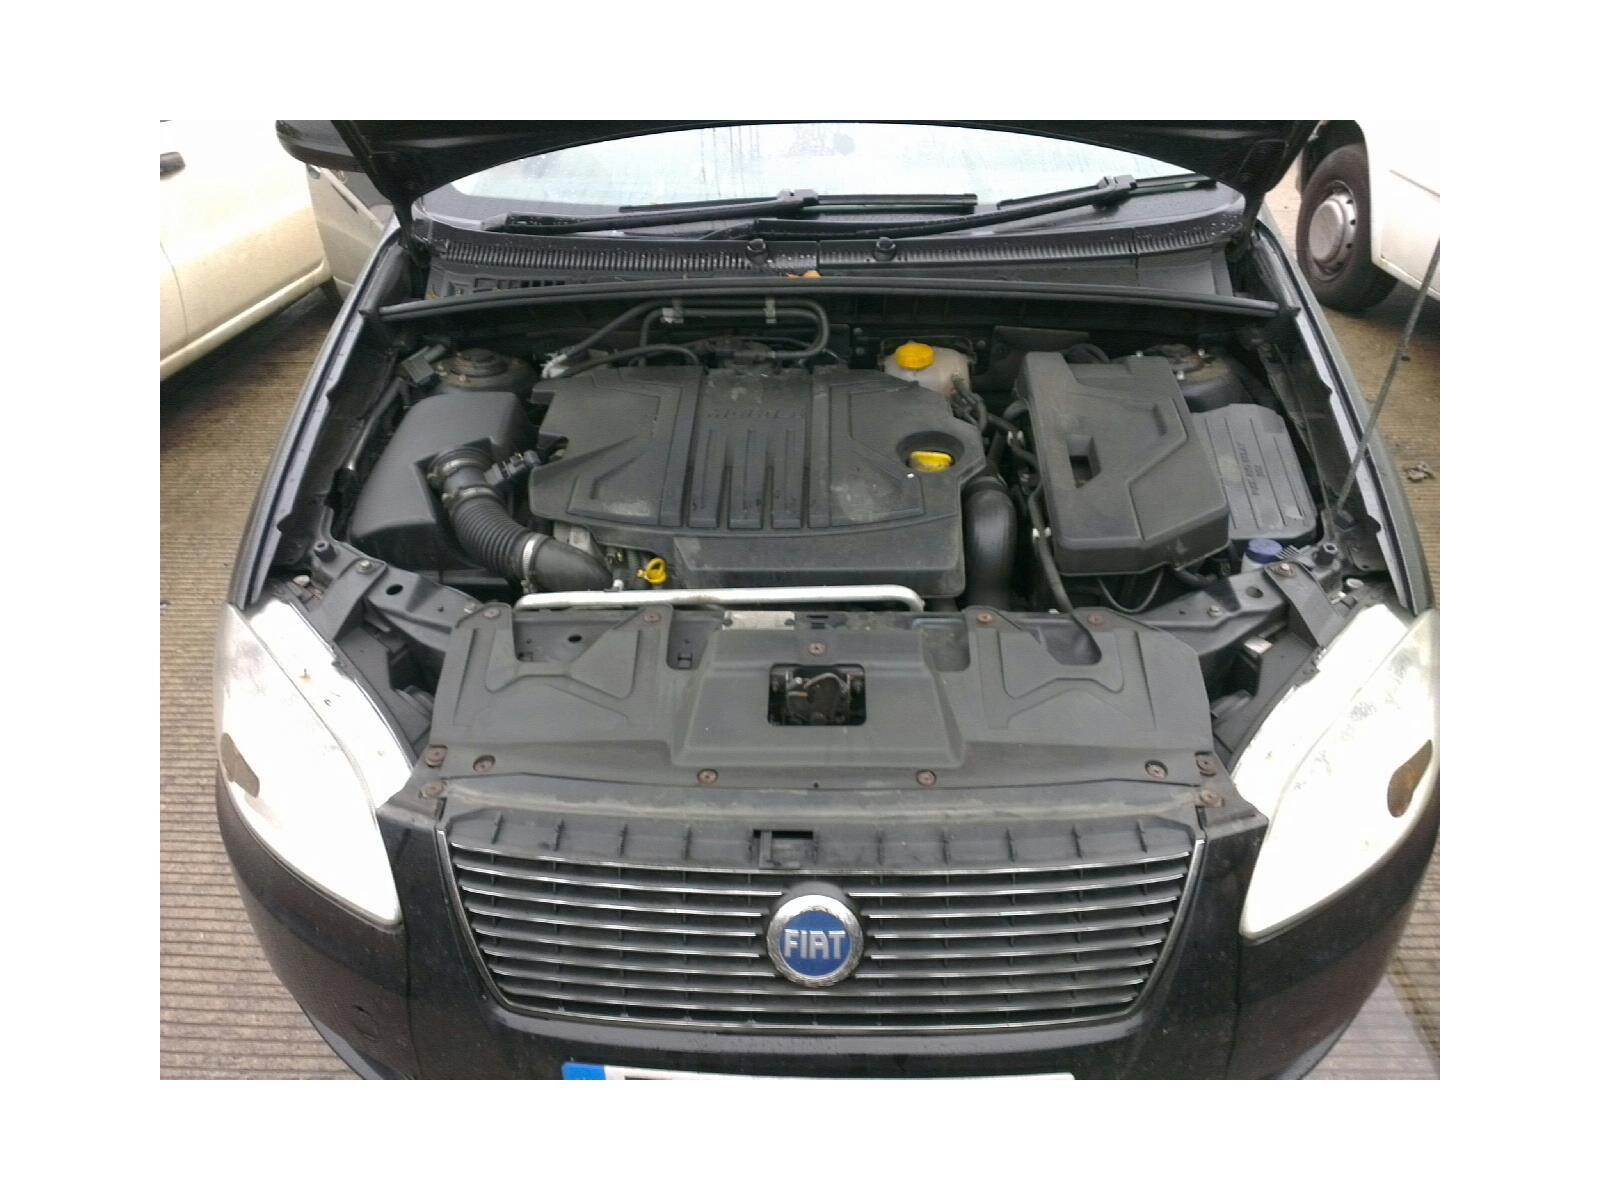 hight resolution of  fiat croma 2005 to 2007 5 door hatchback